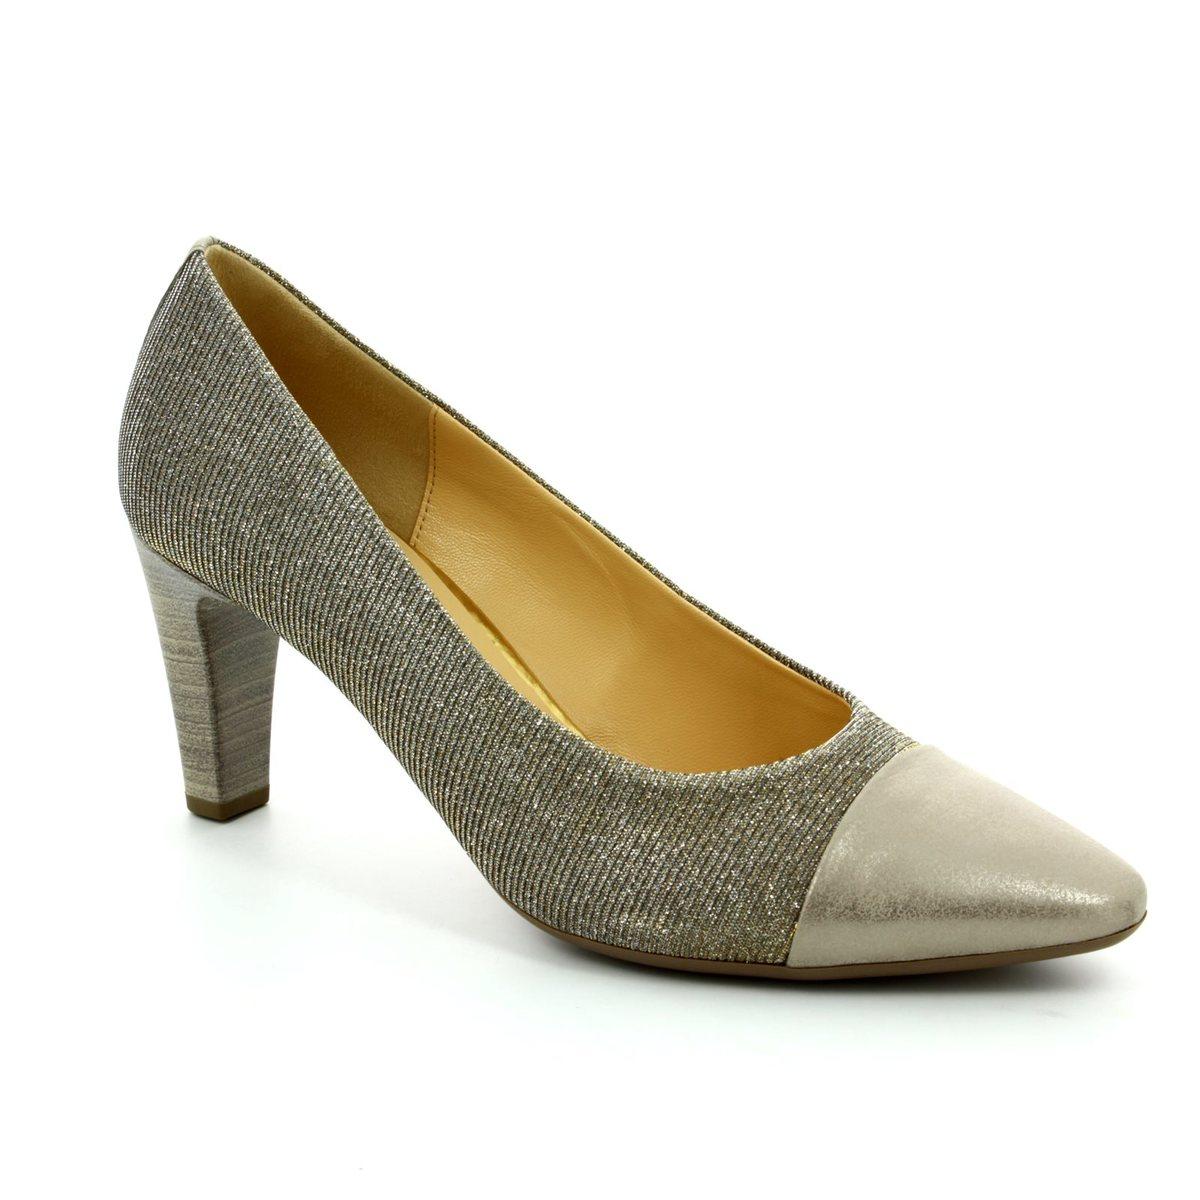 f4ac434c2f Gabor High-heeled Shoes - Gold - 65.152.62 DANTE